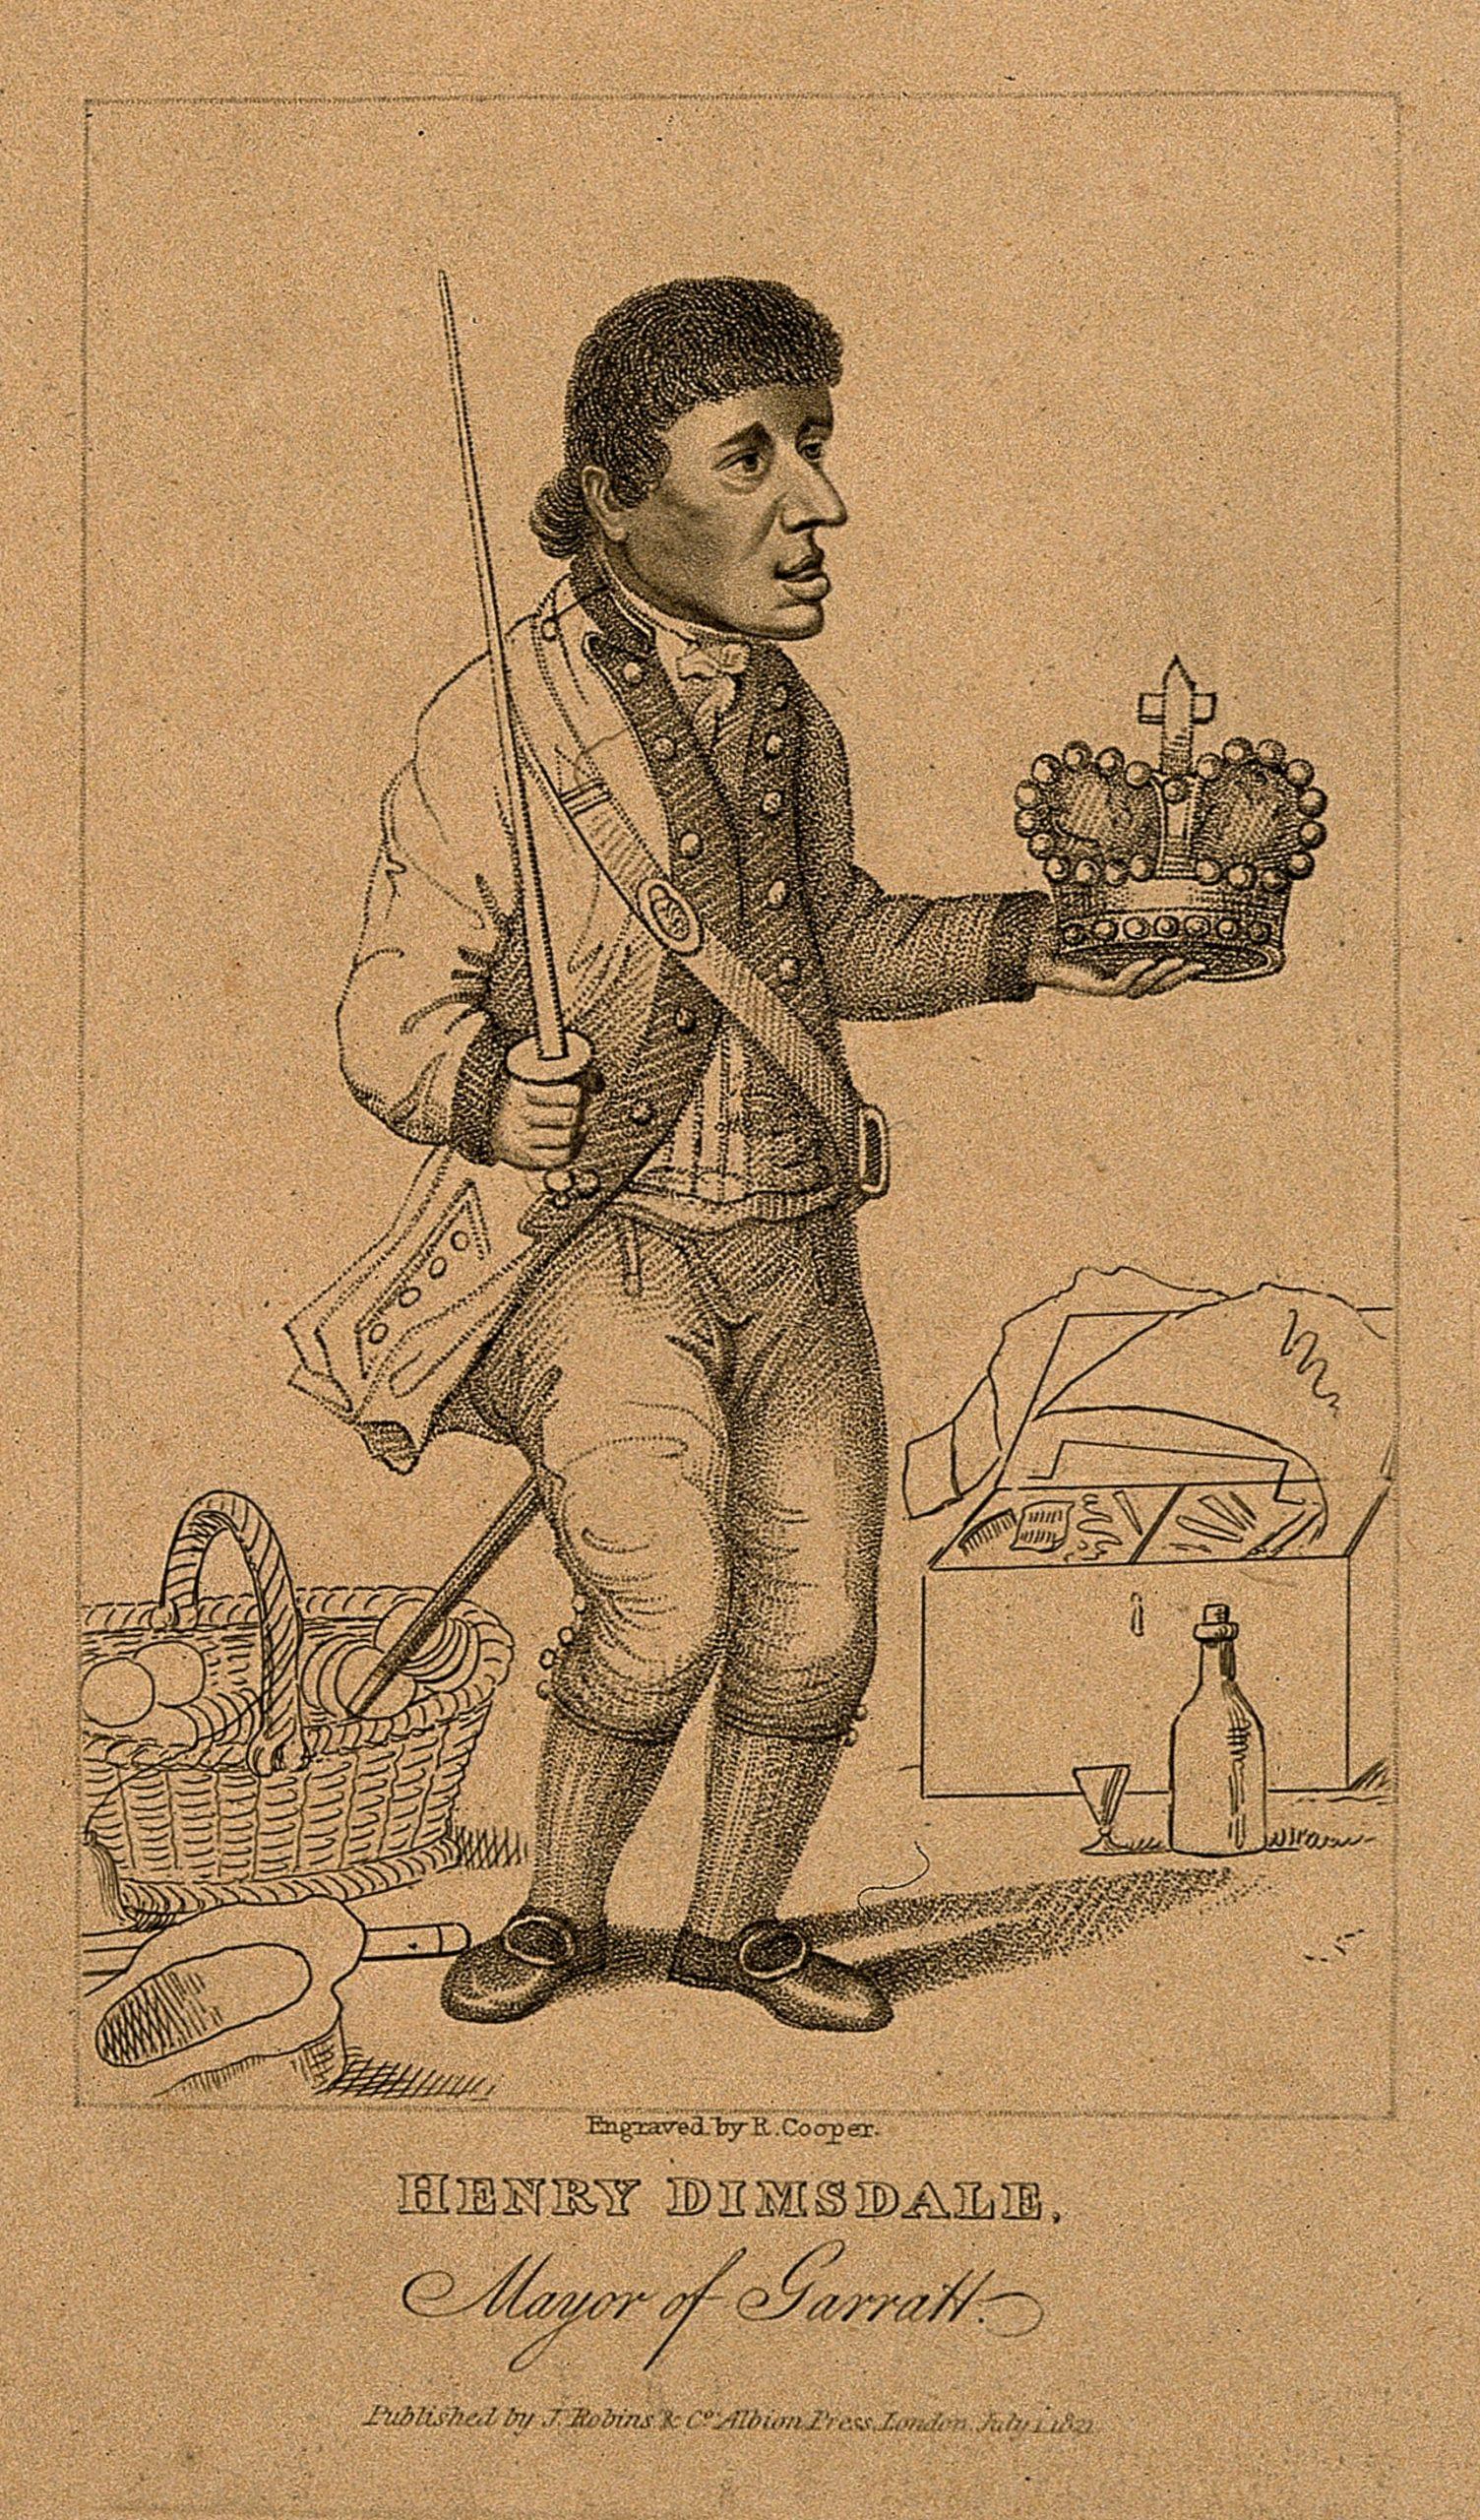 Henry Dimsdale. Mayor of Garratt. engraved by R. Cooper